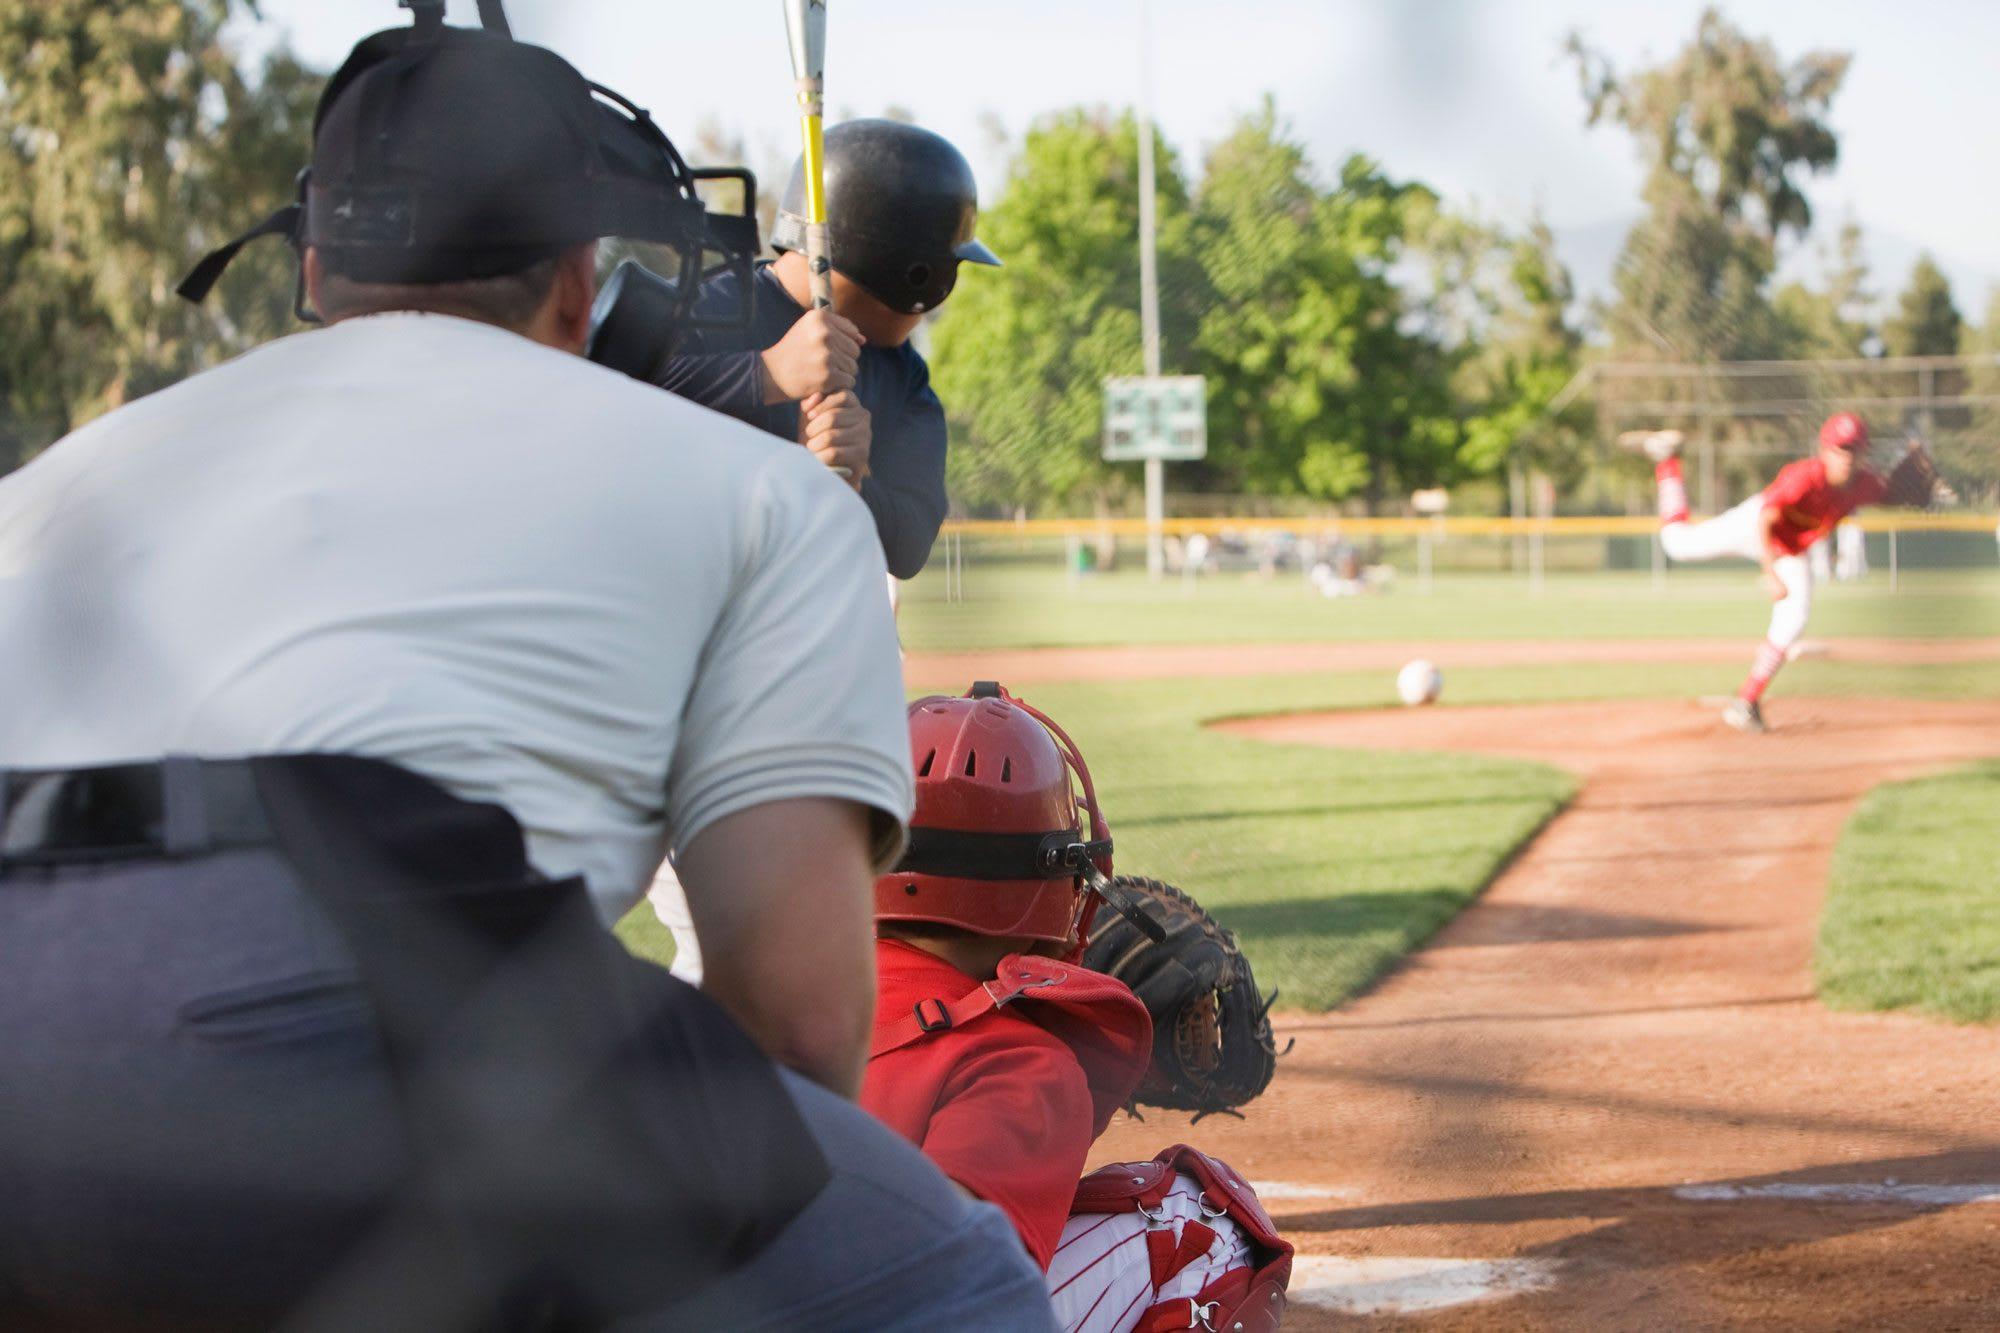 umpire-behind-plate